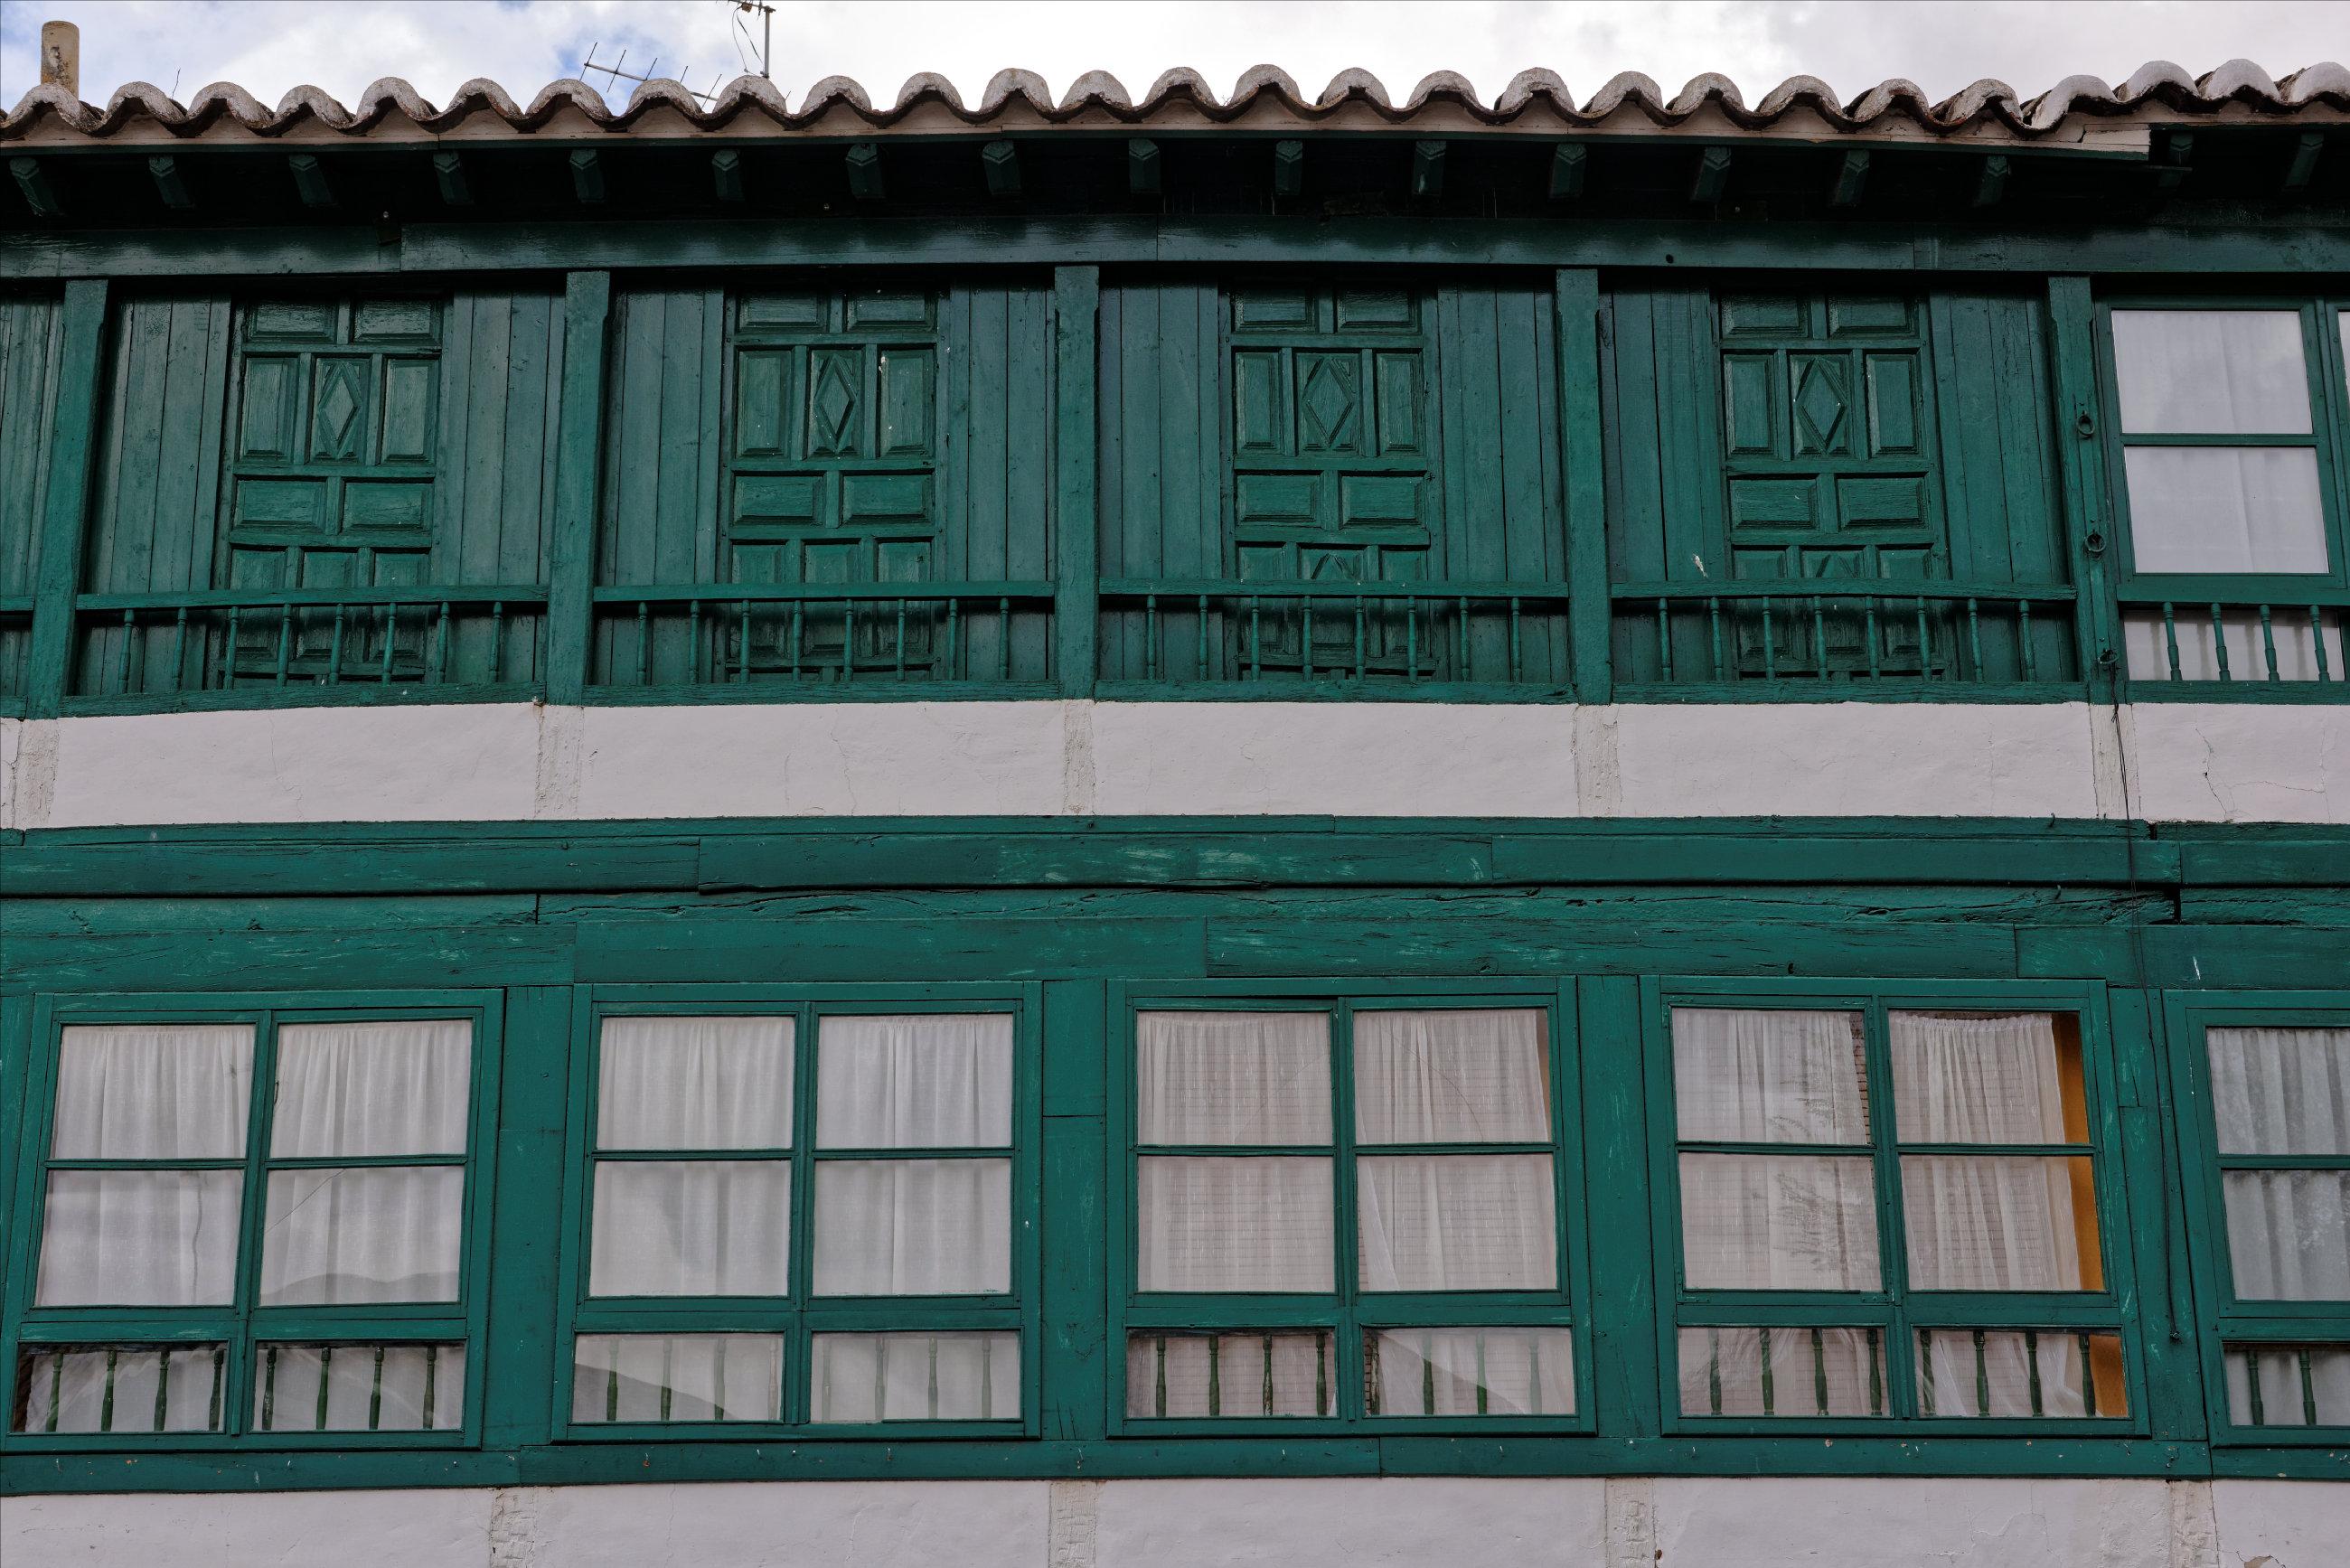 151102-Almagro (20)